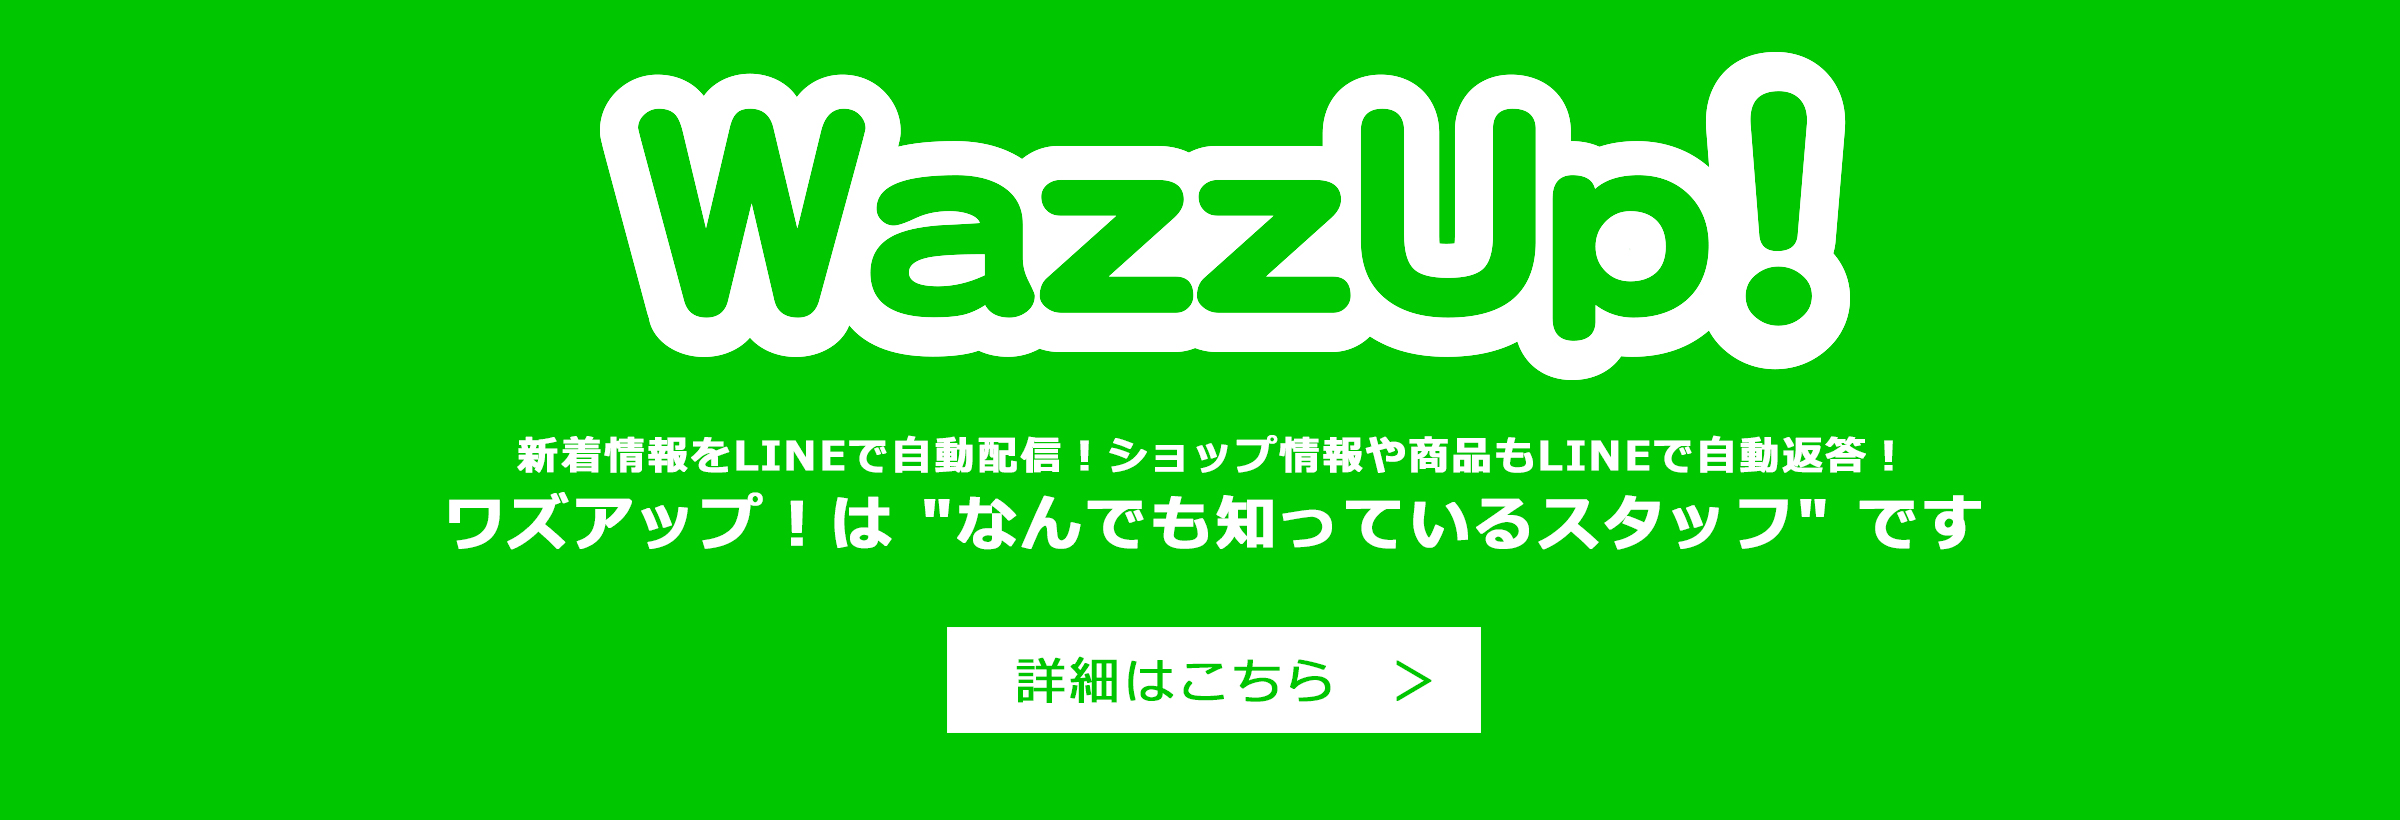 WazzUp!( ワズアップ )|LINE 上で実現!手間は一切不要の自動接客ツール